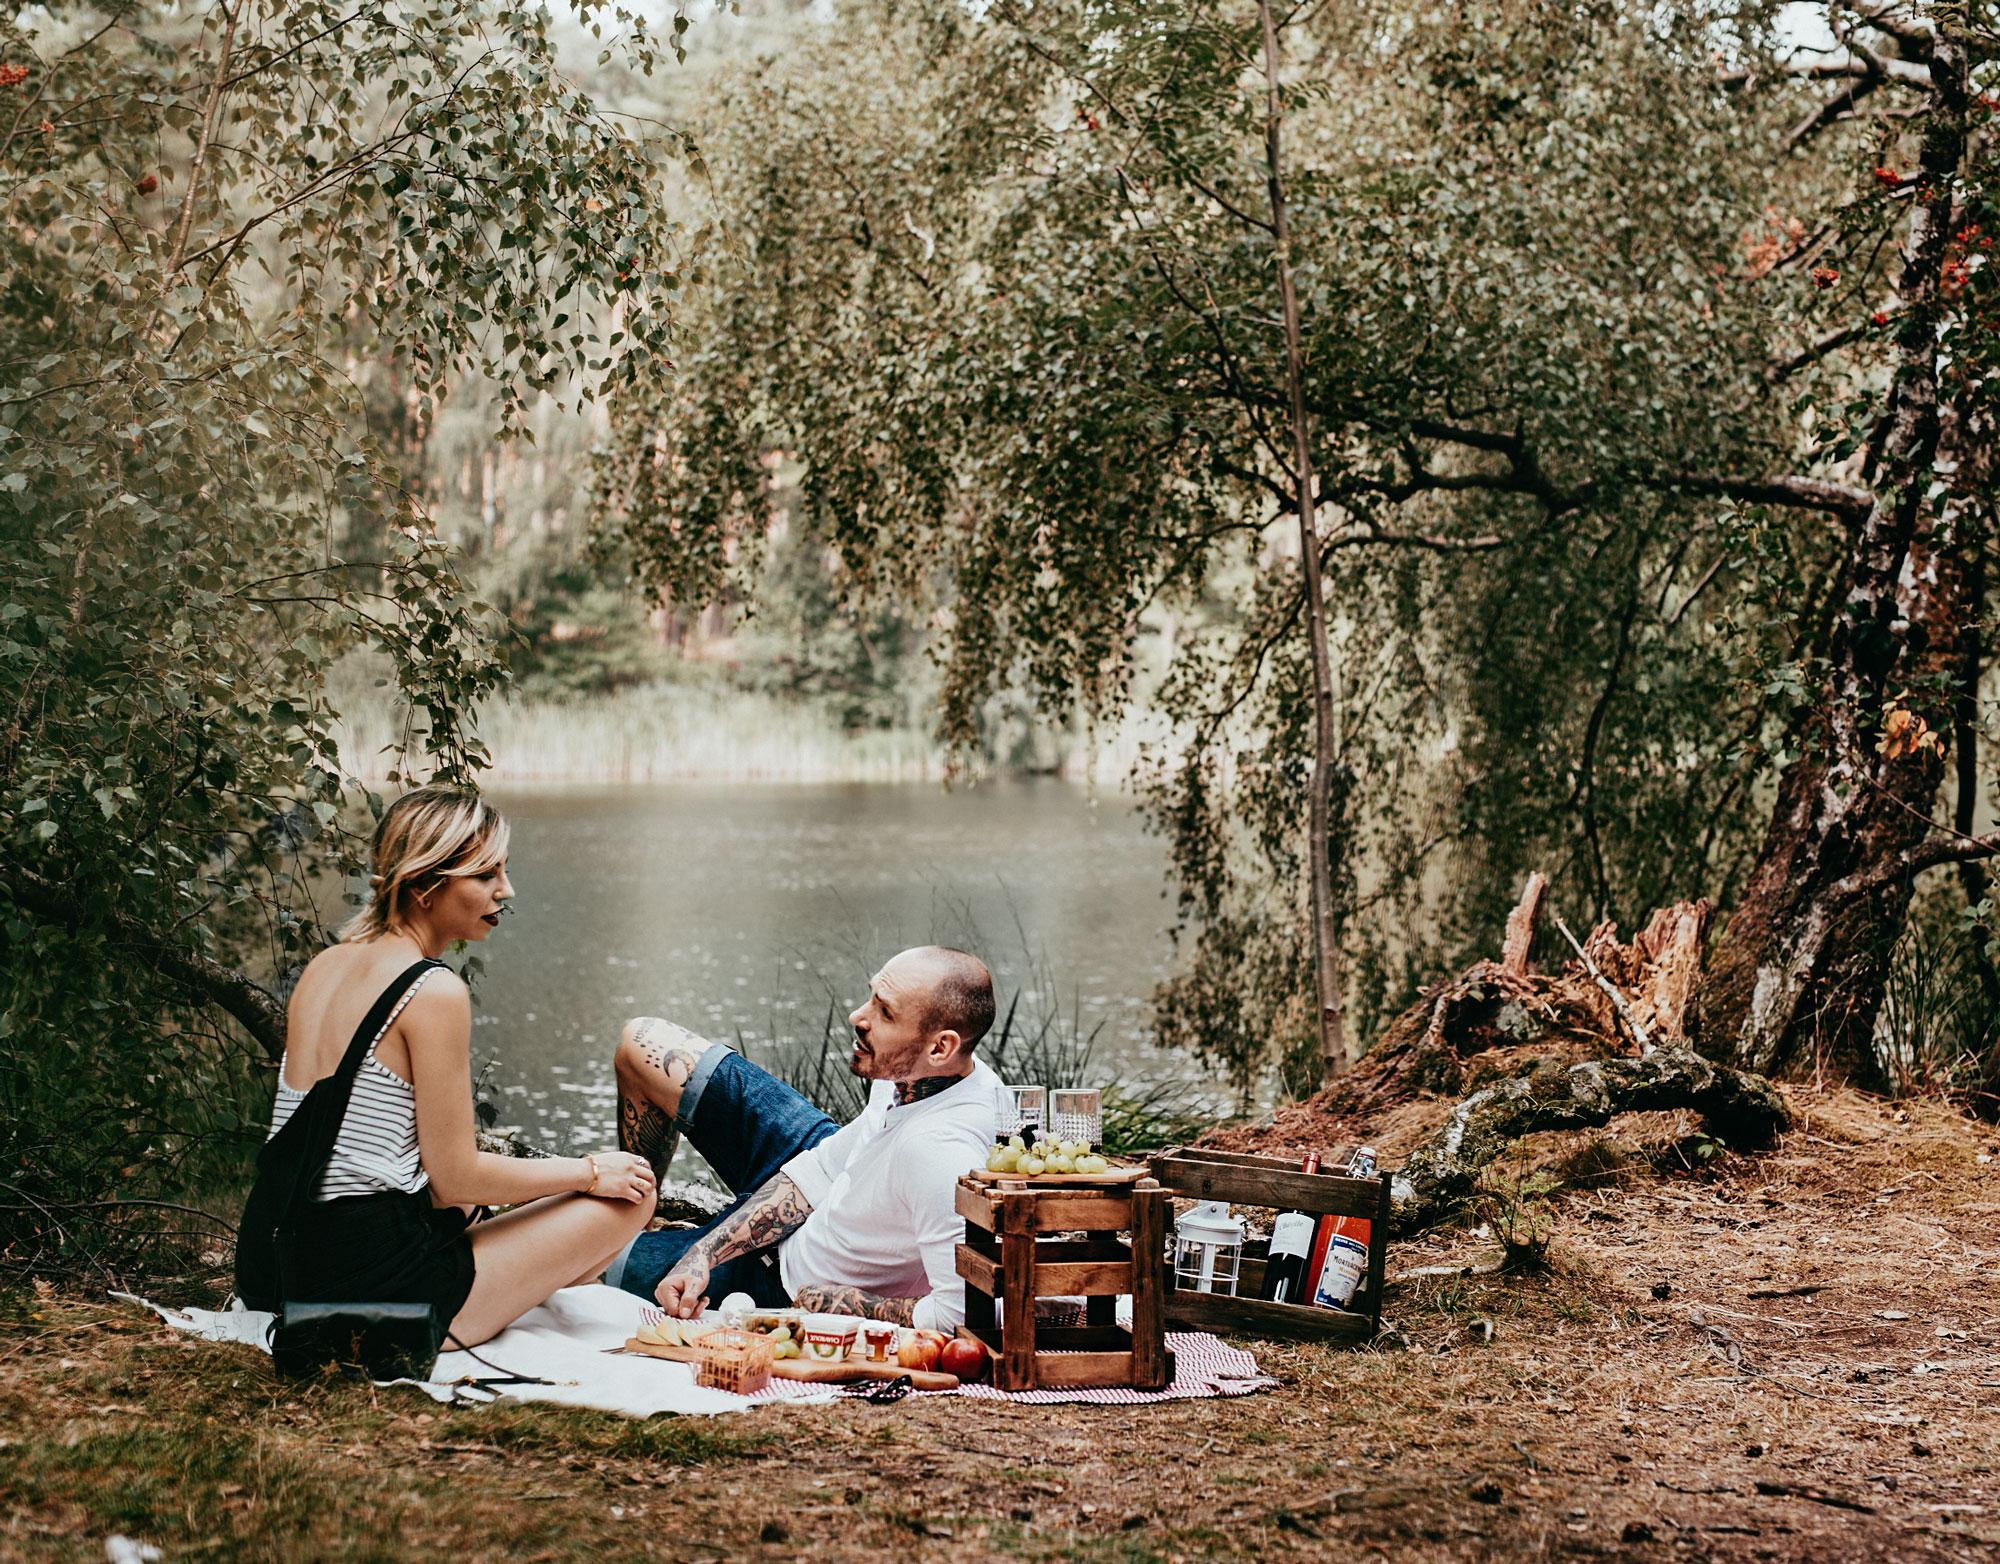 YSL Mon Paris   Masha & her boyfriend Swen   french picknick   Berlin Müggelsee   find more pictures on my blog